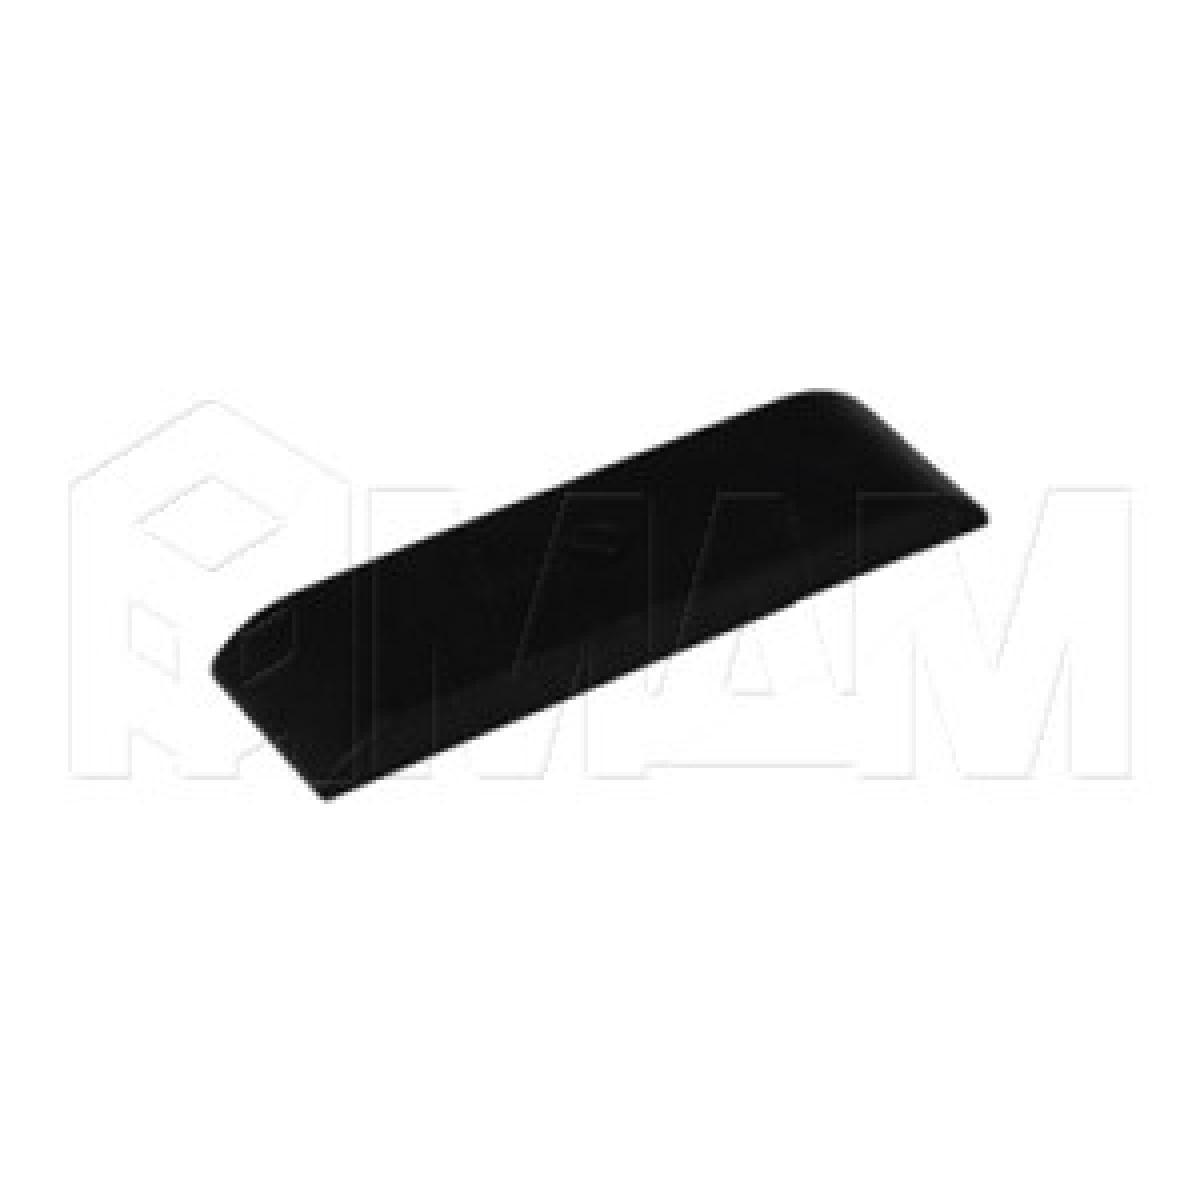 LIBRA CC2 Заглушка для навесов D12, пластик, черная